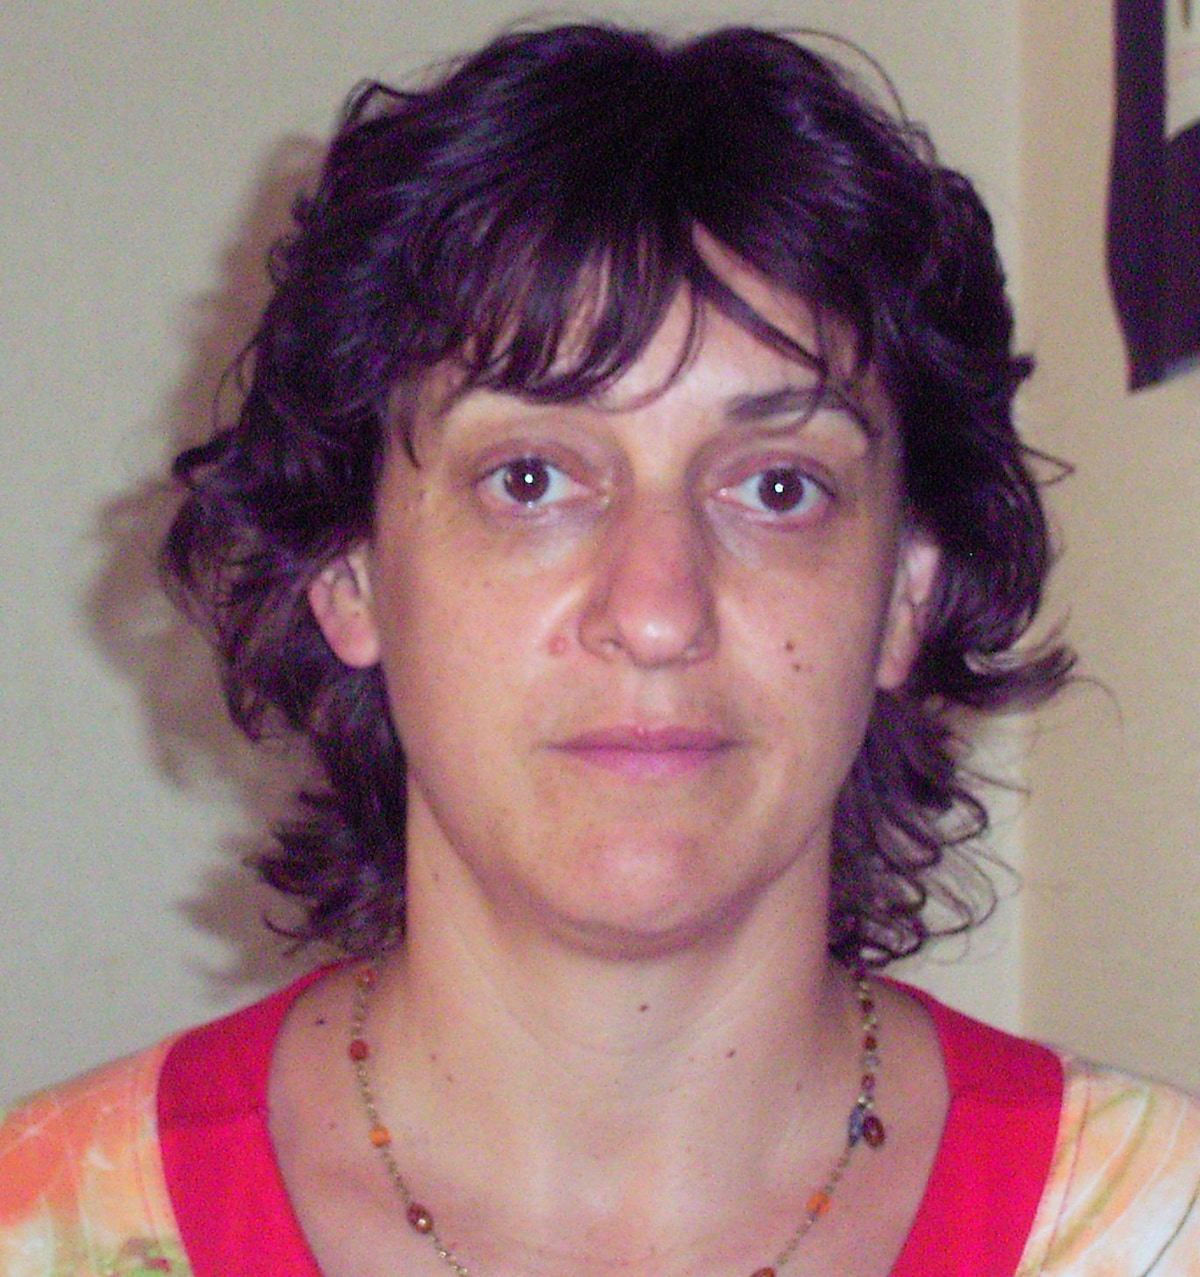 Sylvie From Saint-Geniès, France